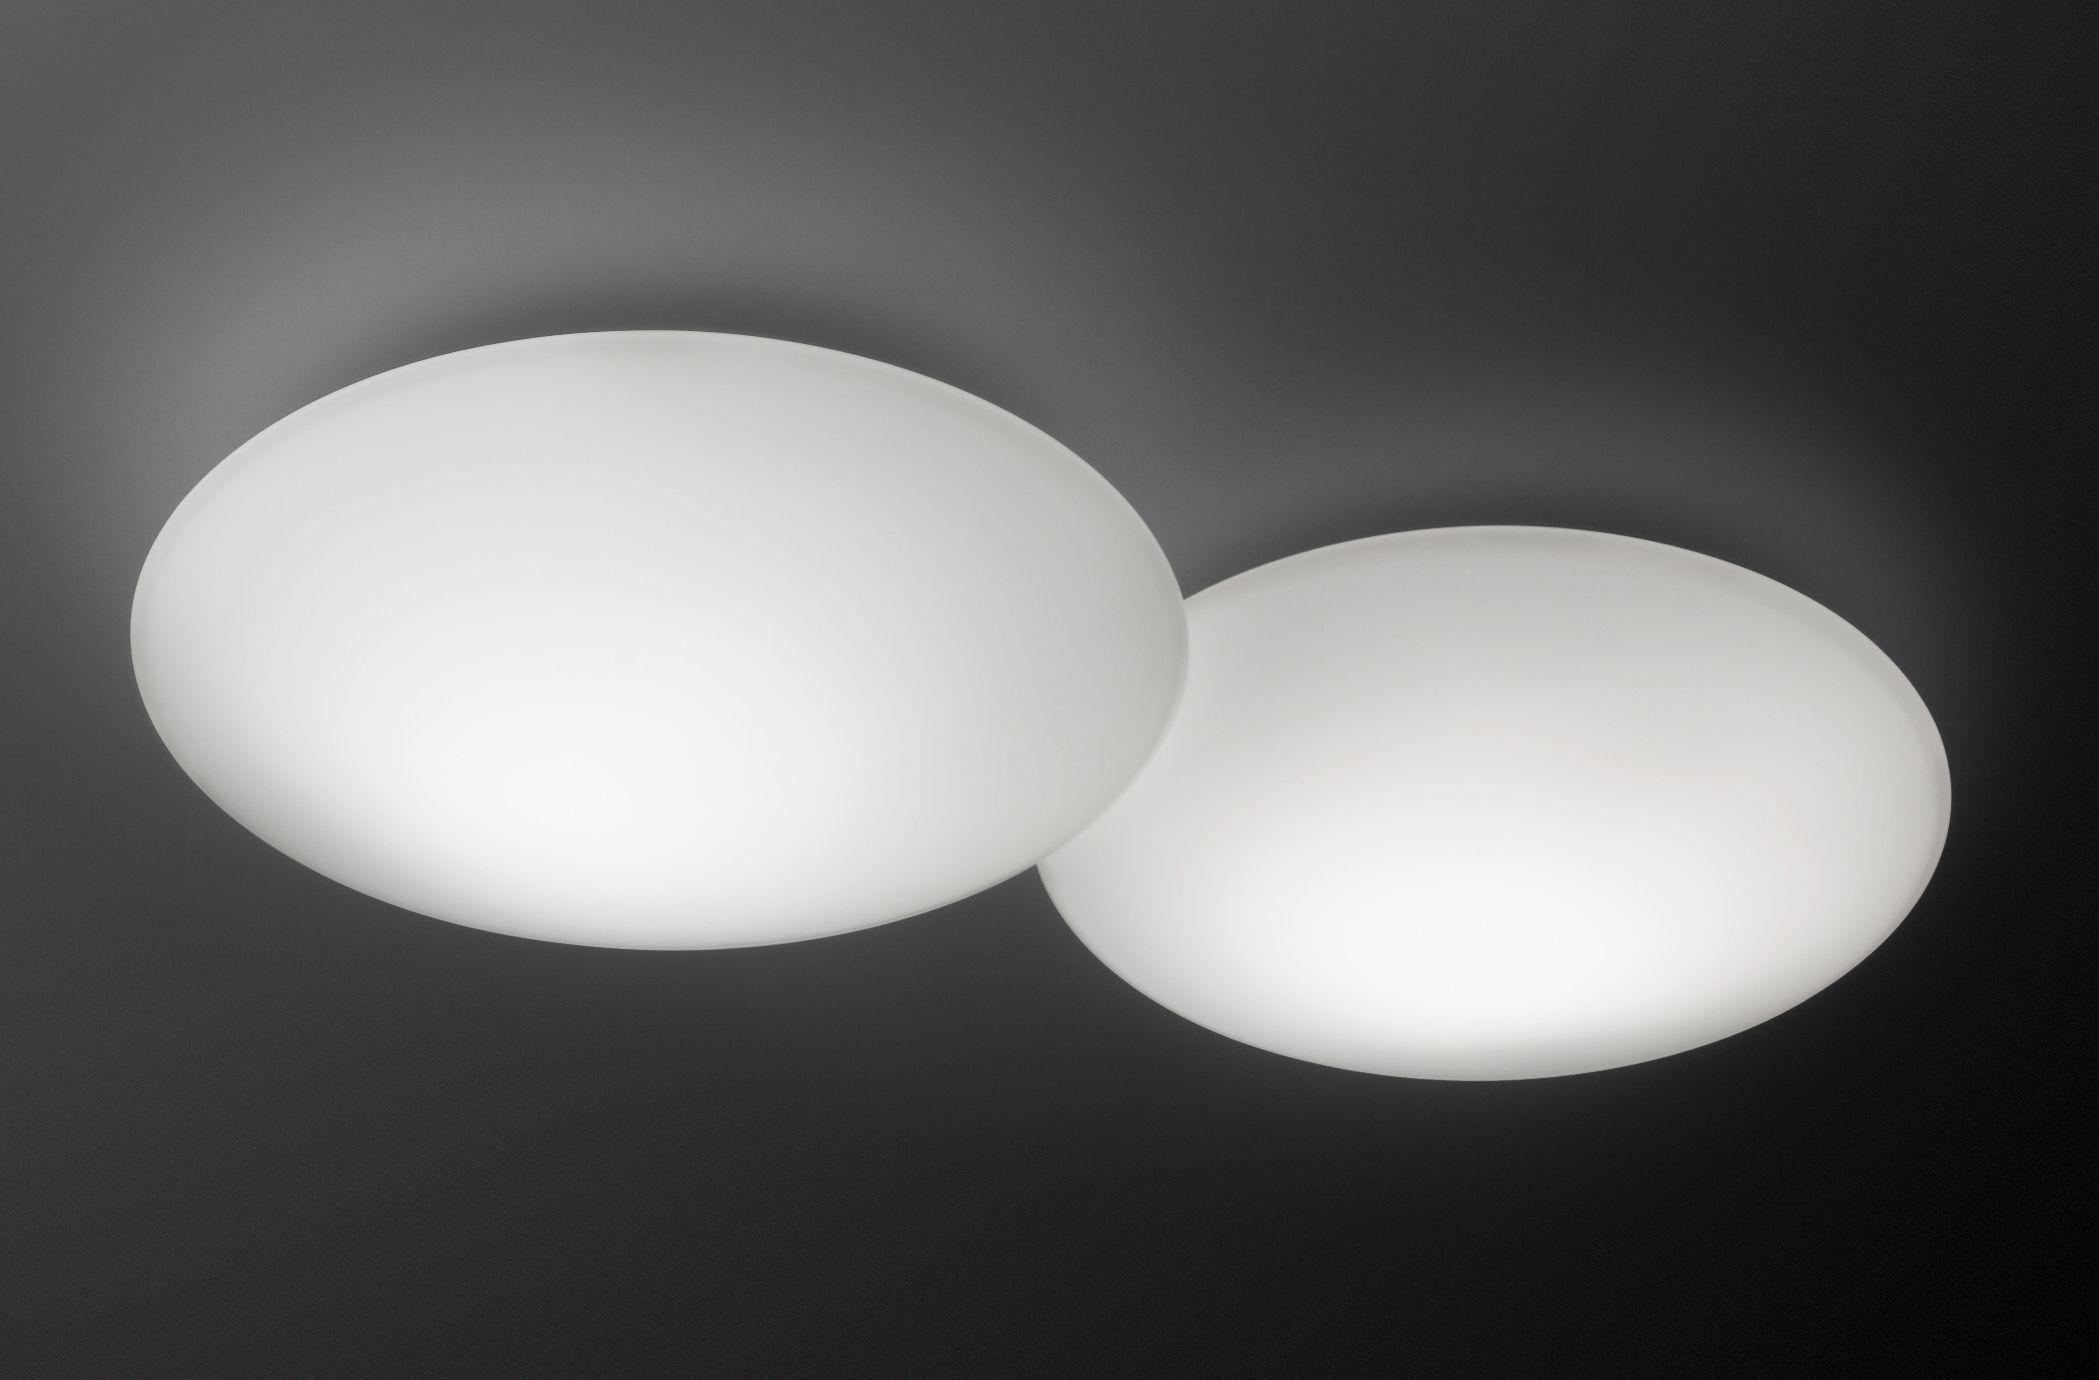 Plafoniere Moderne Da Parete : Puck double led applique plafoniera bianco by vibia made in design